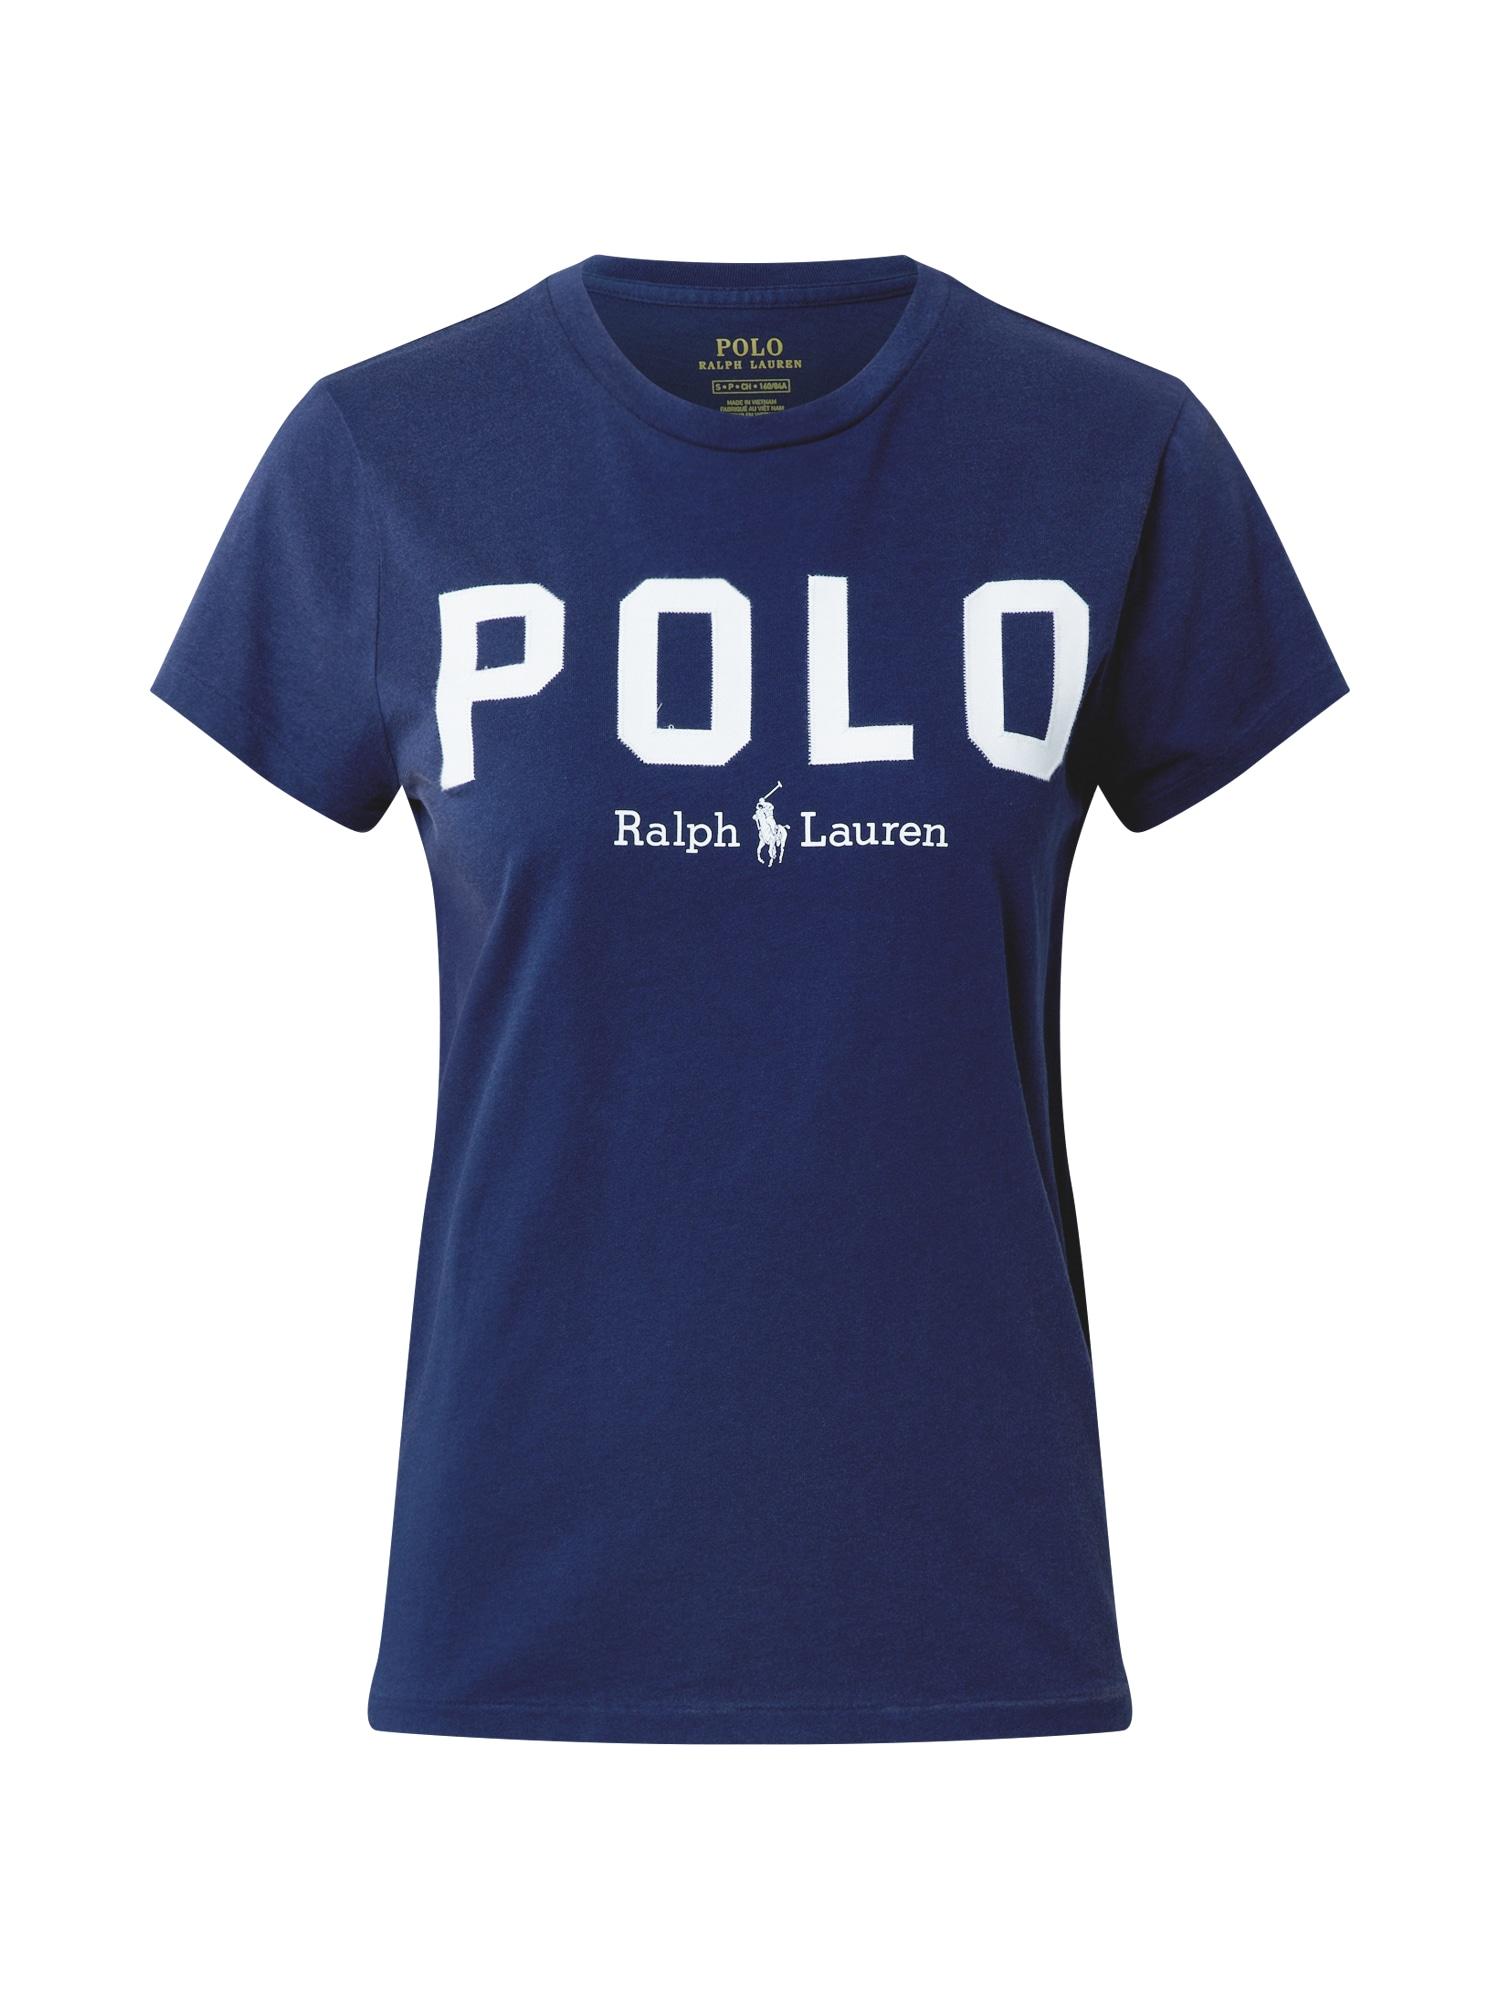 POLO RALPH LAUREN Tričko  námořnická modř / bílá